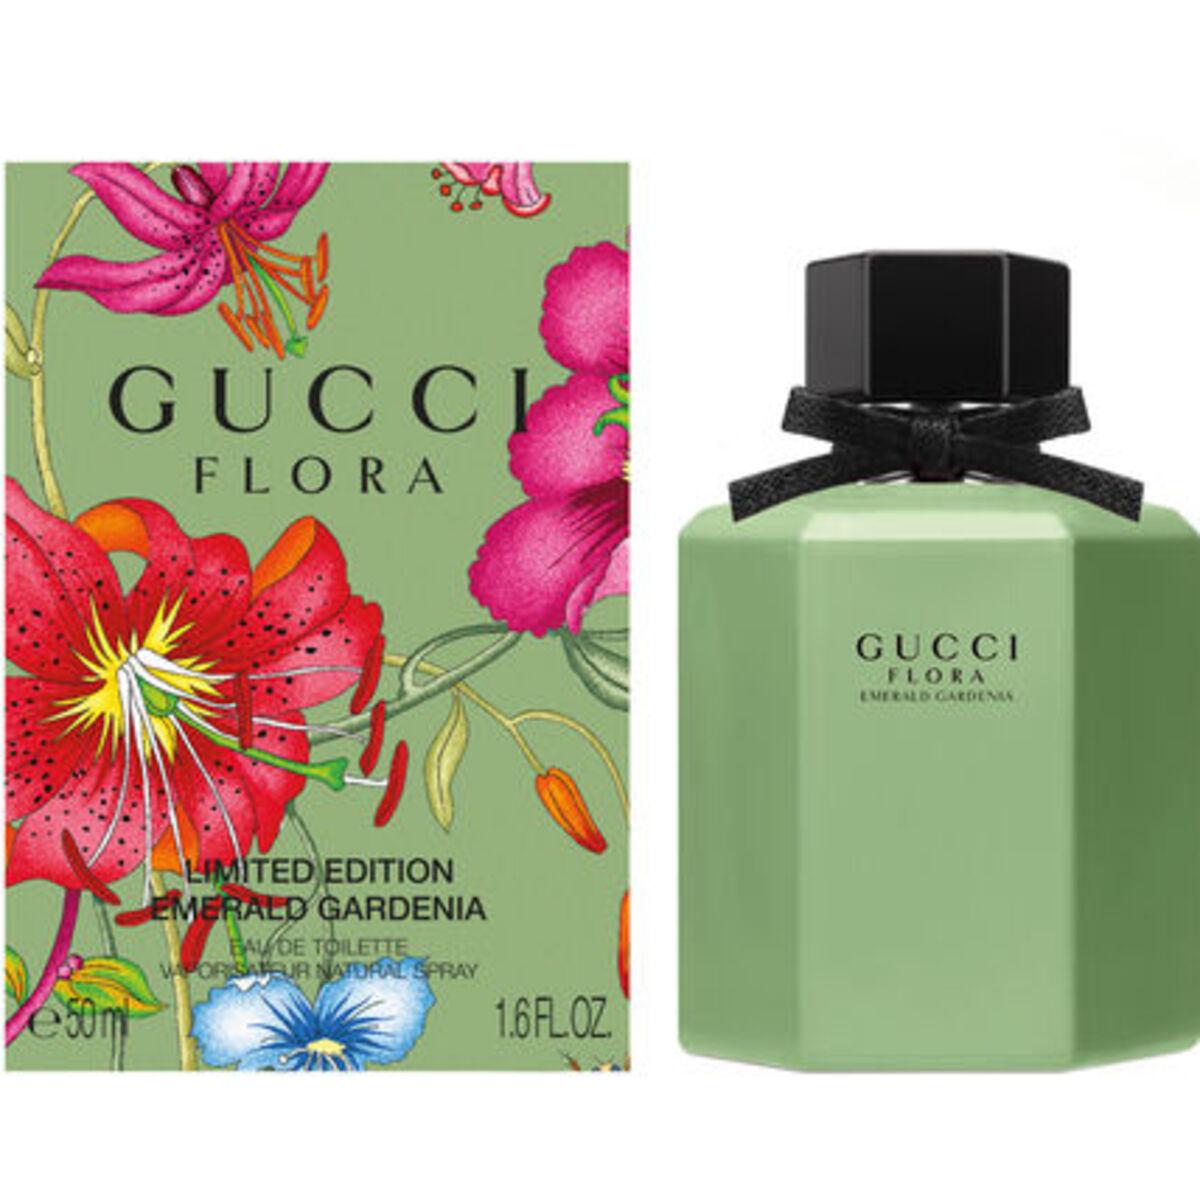 Bild 2 von Gucci Flora Emerald Gardenia, Eau de Toilette